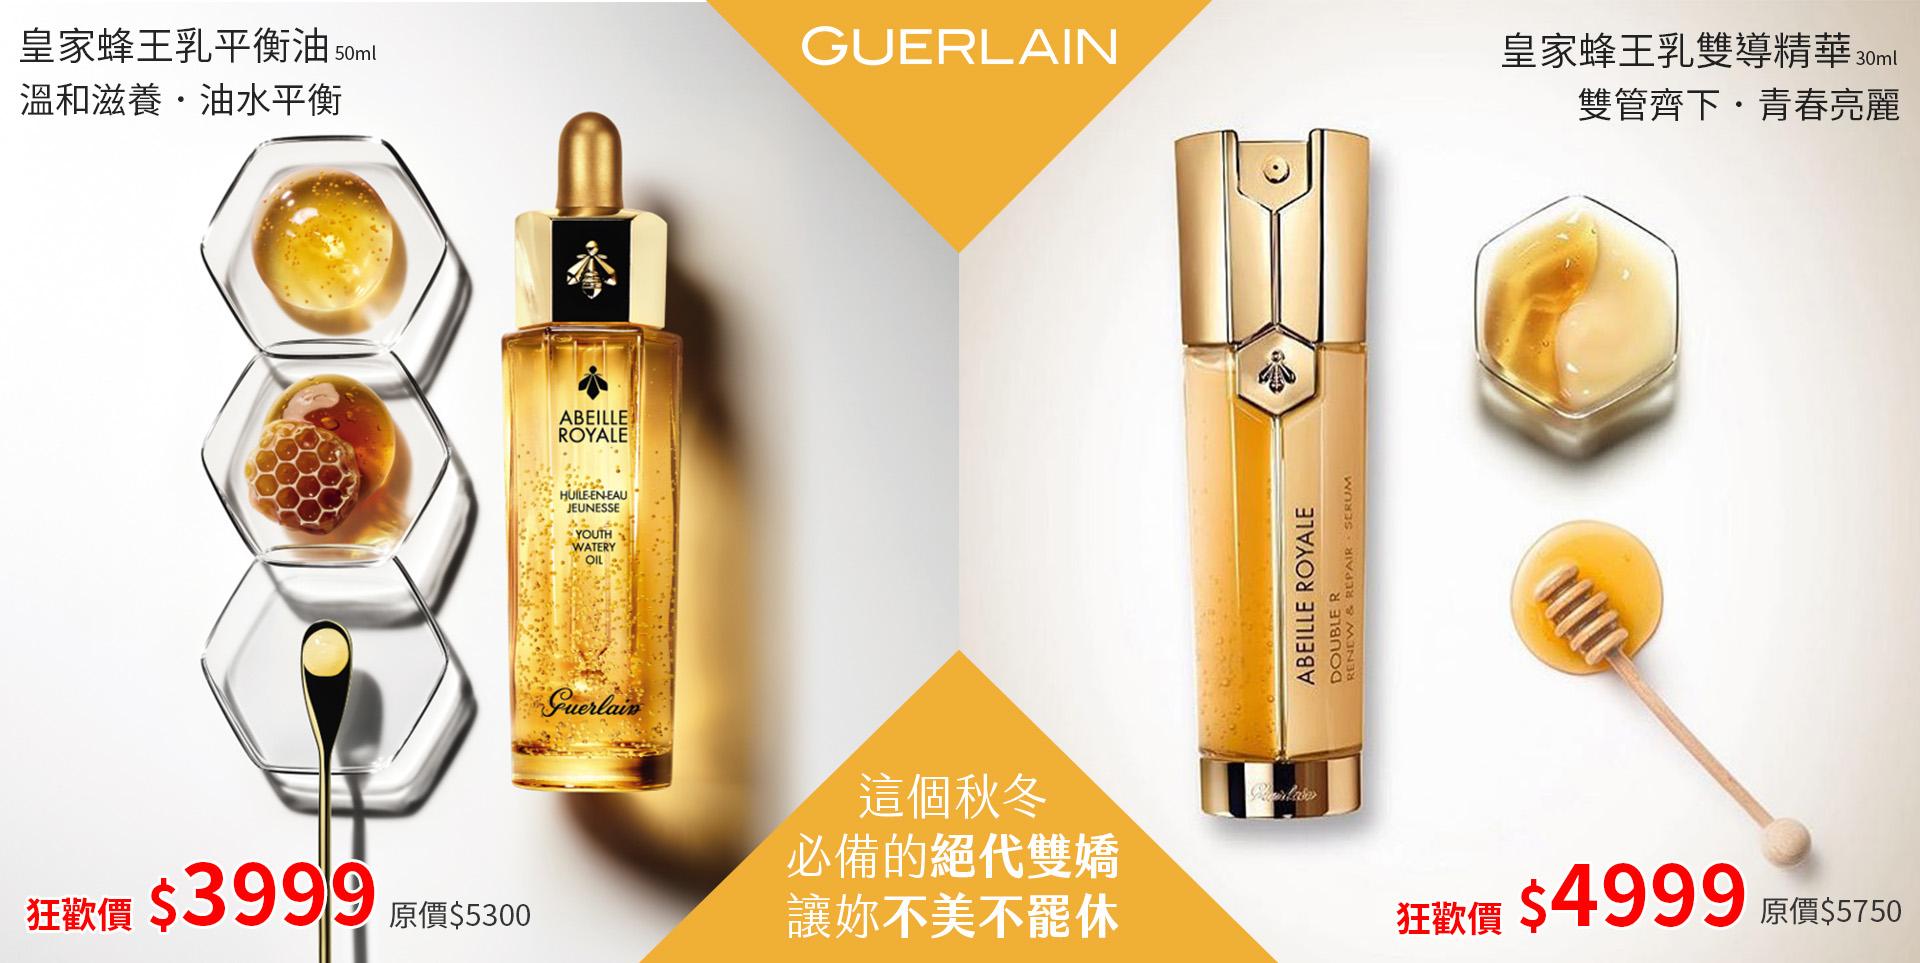 Guerlain 嬌蘭 皇家蜂王乳系列 暢銷明星商品